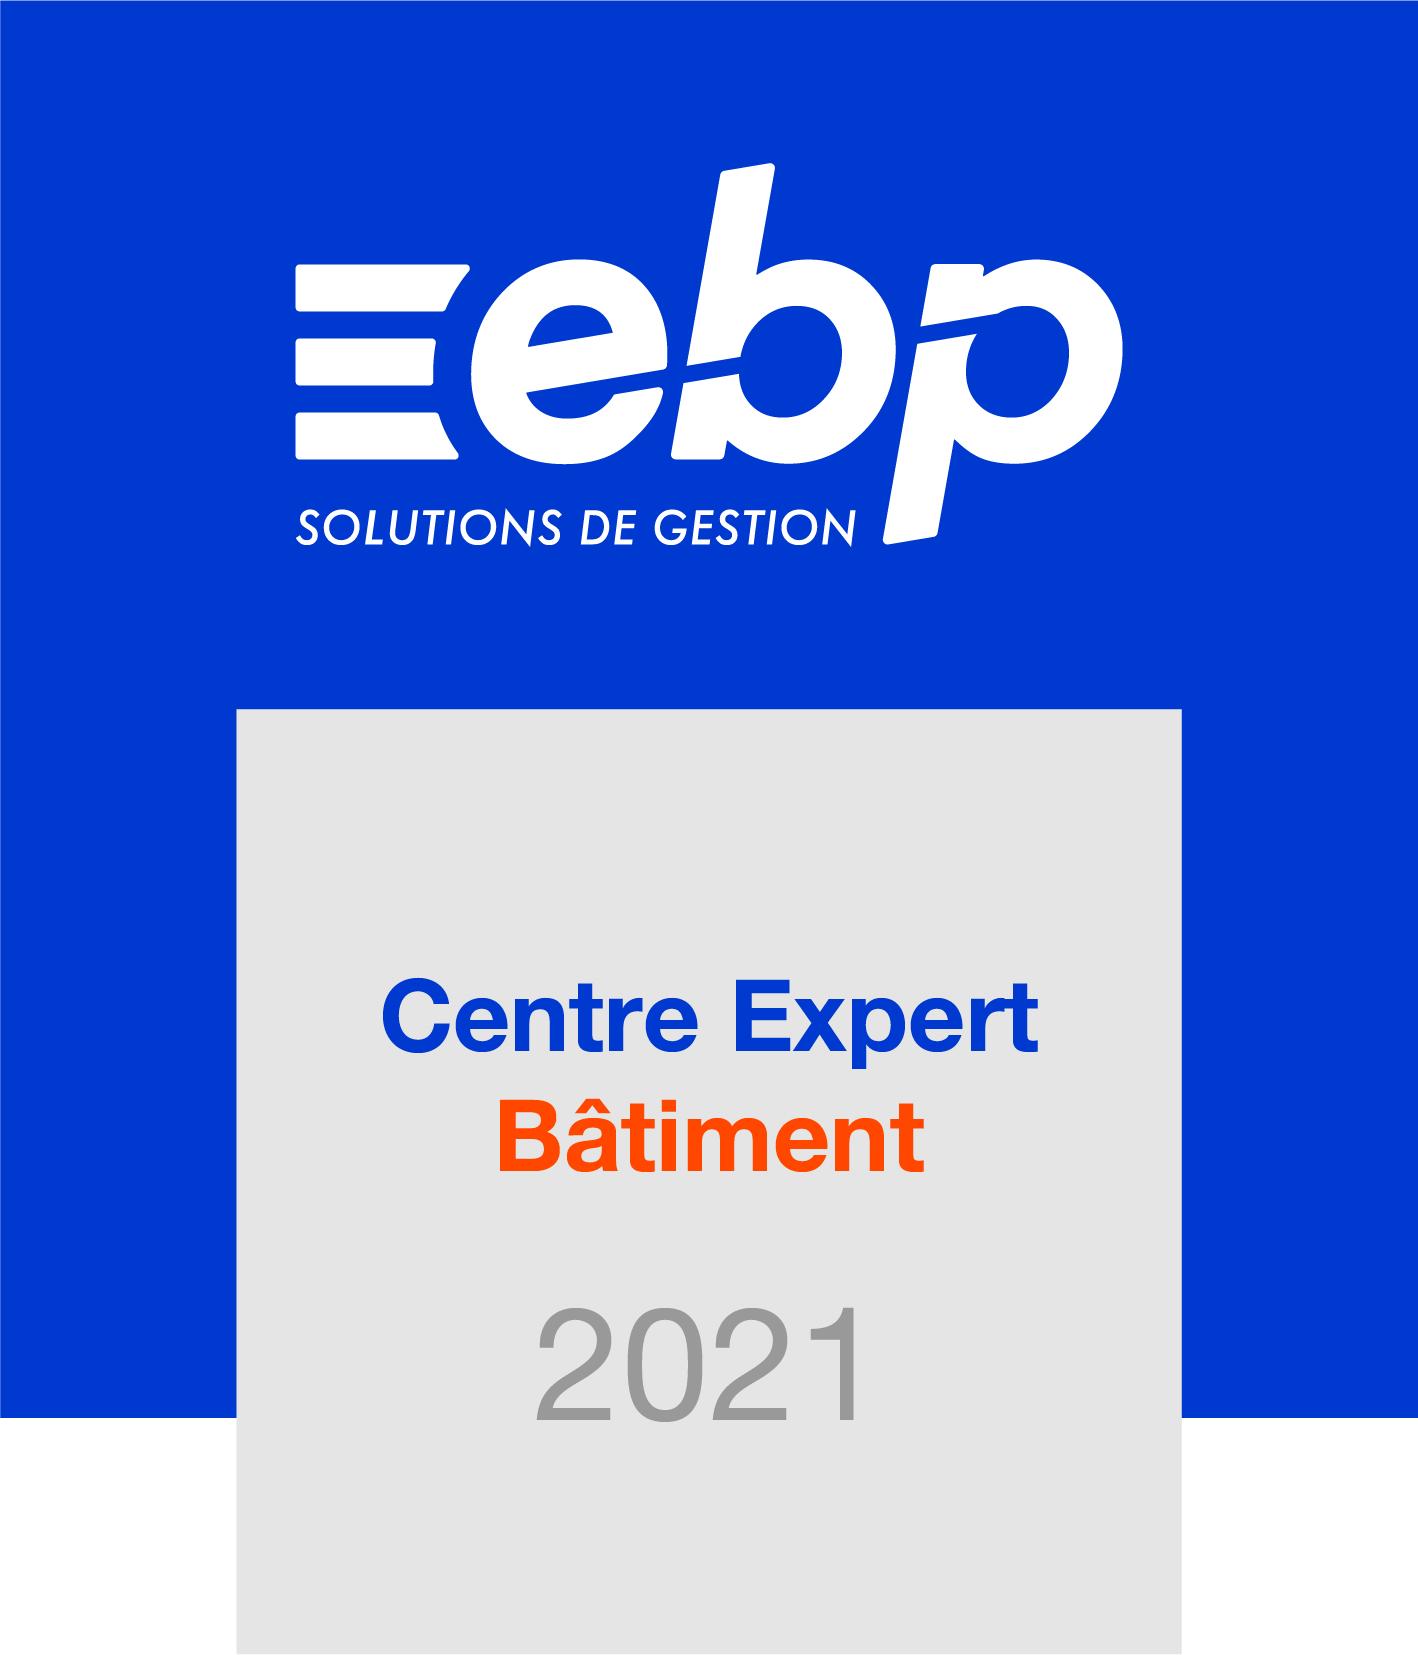 ebp Centre Expert Batiment 2021